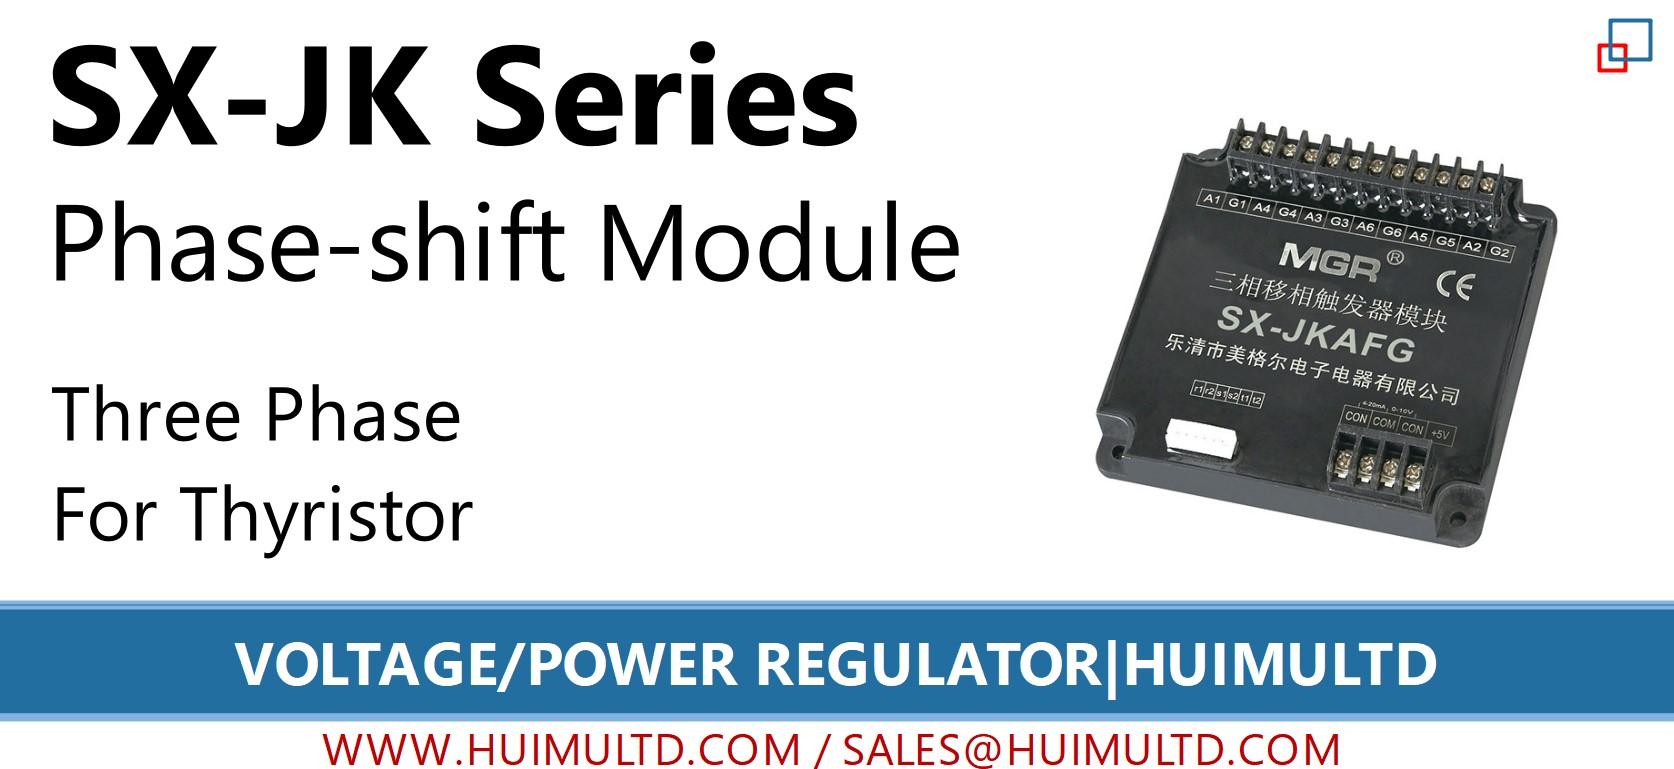 SX-JK Series Voltage Power Regulator